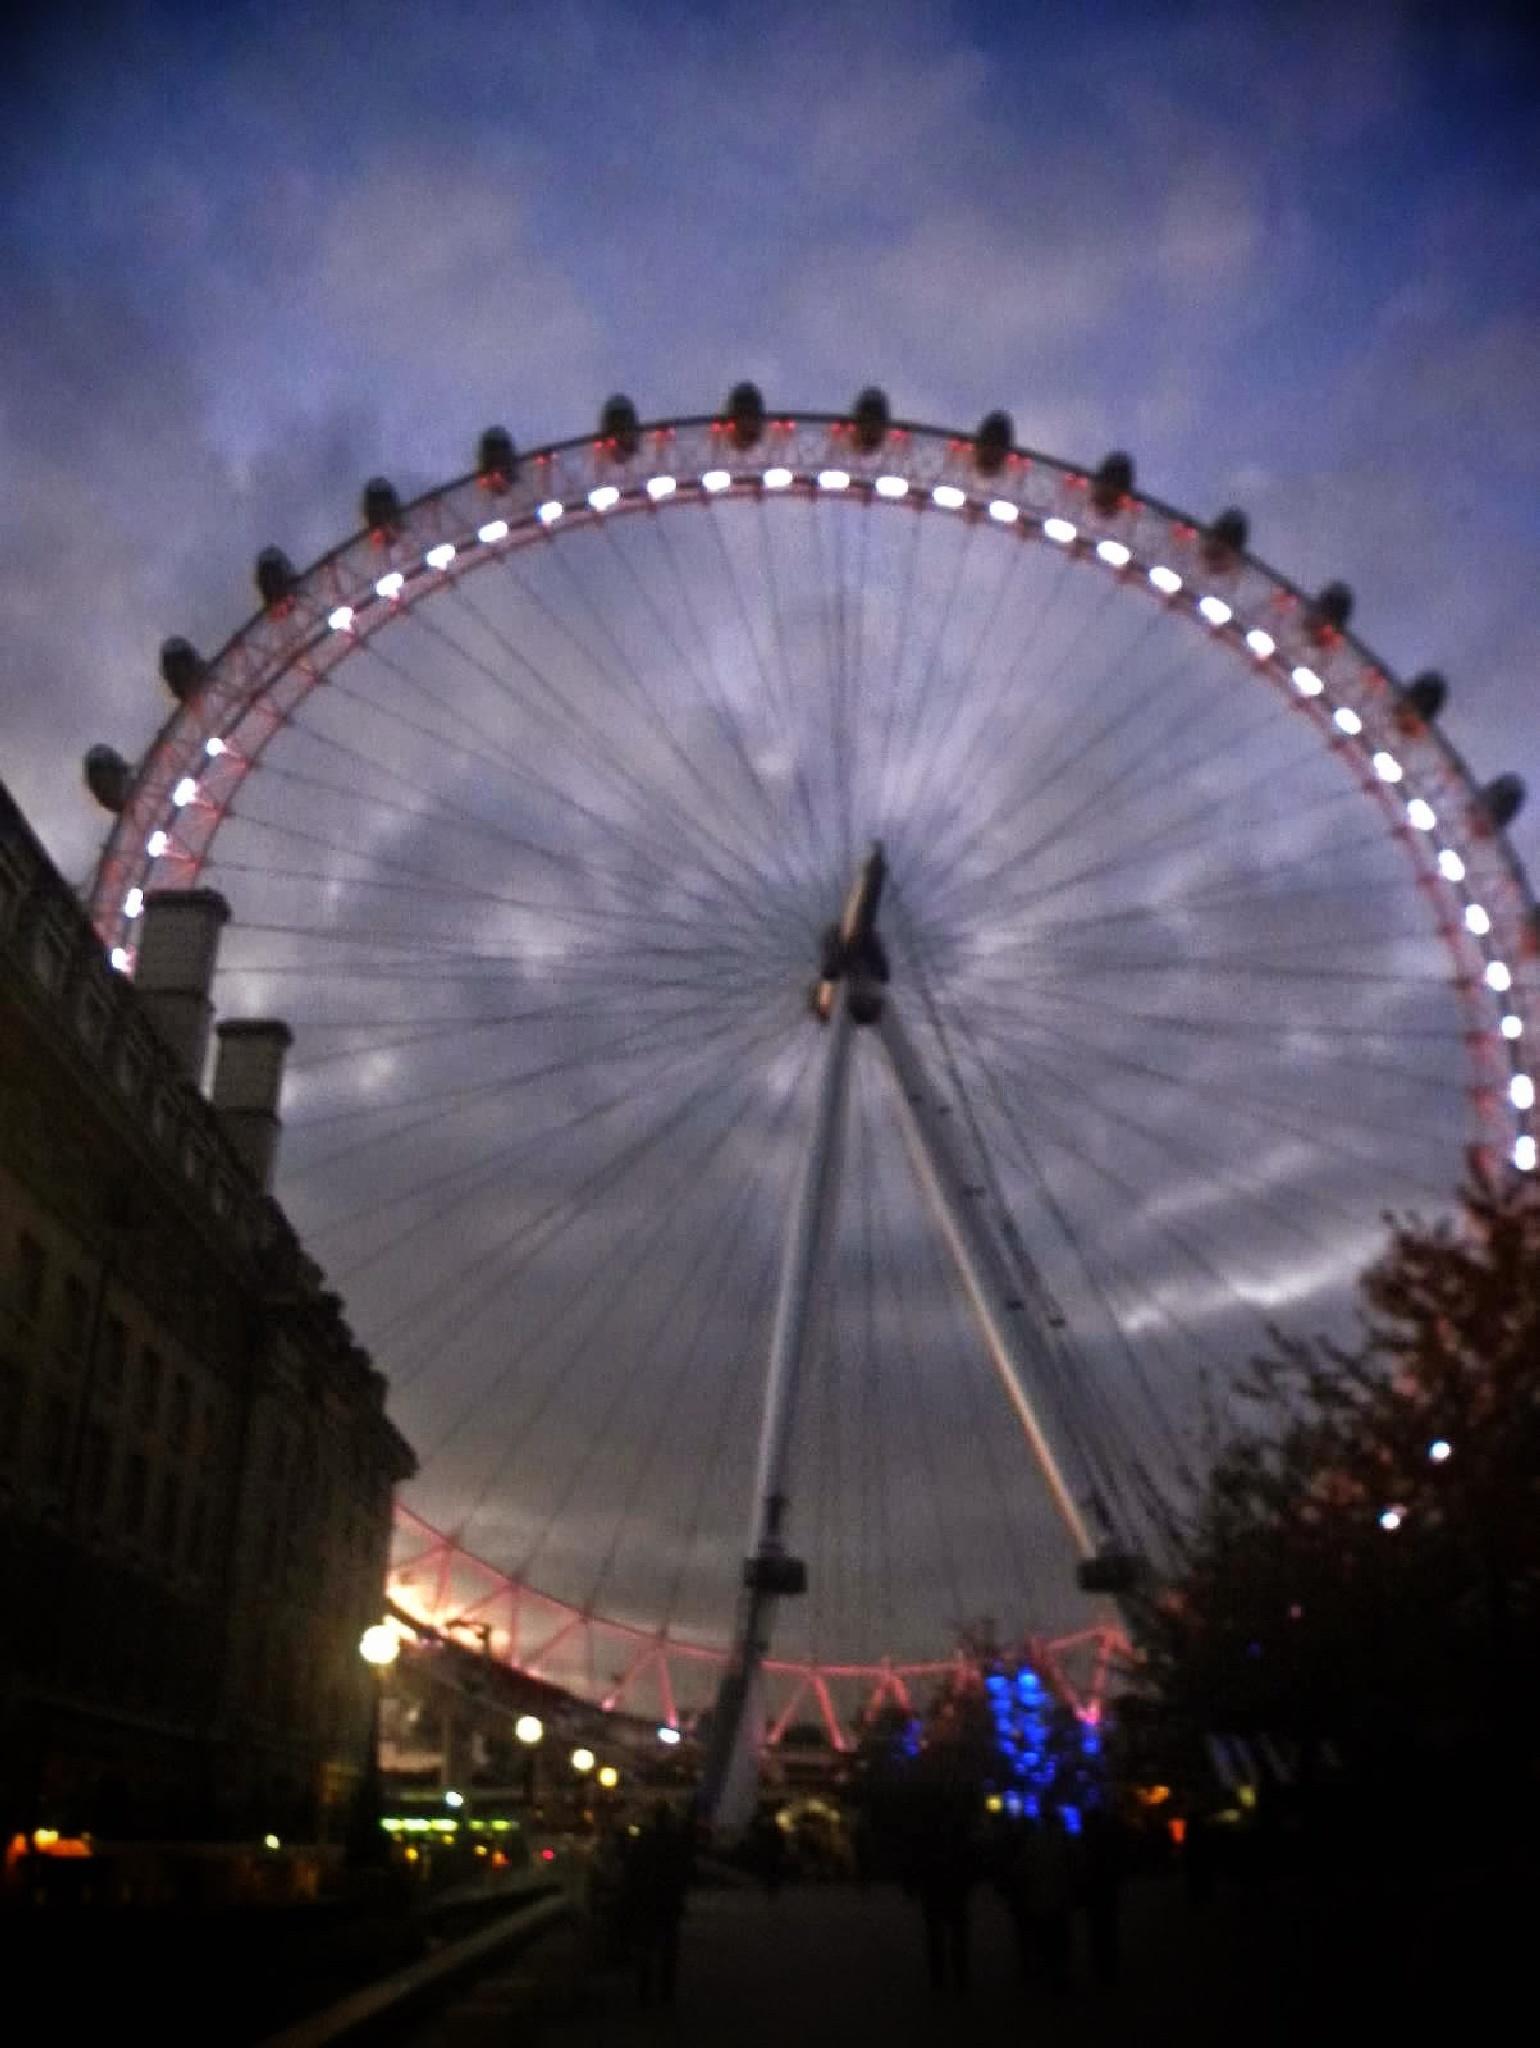 Sunset at London Eye  by marinna67